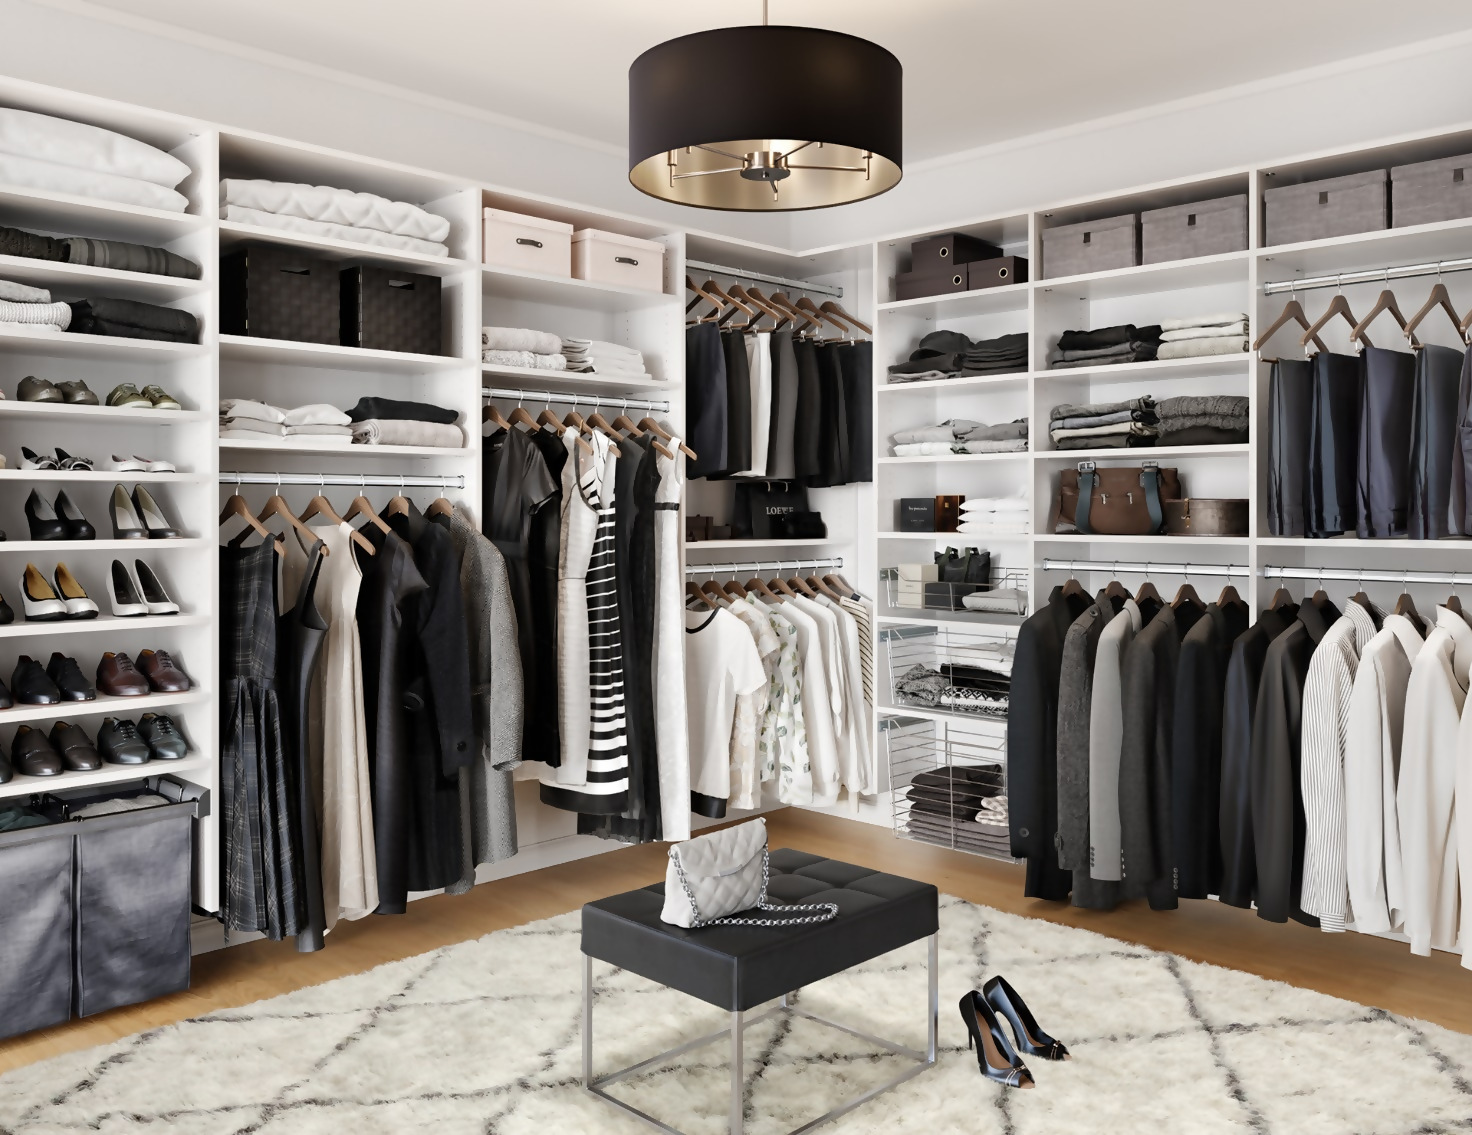 The Best Closet Organization Ideas Interior Design Explained